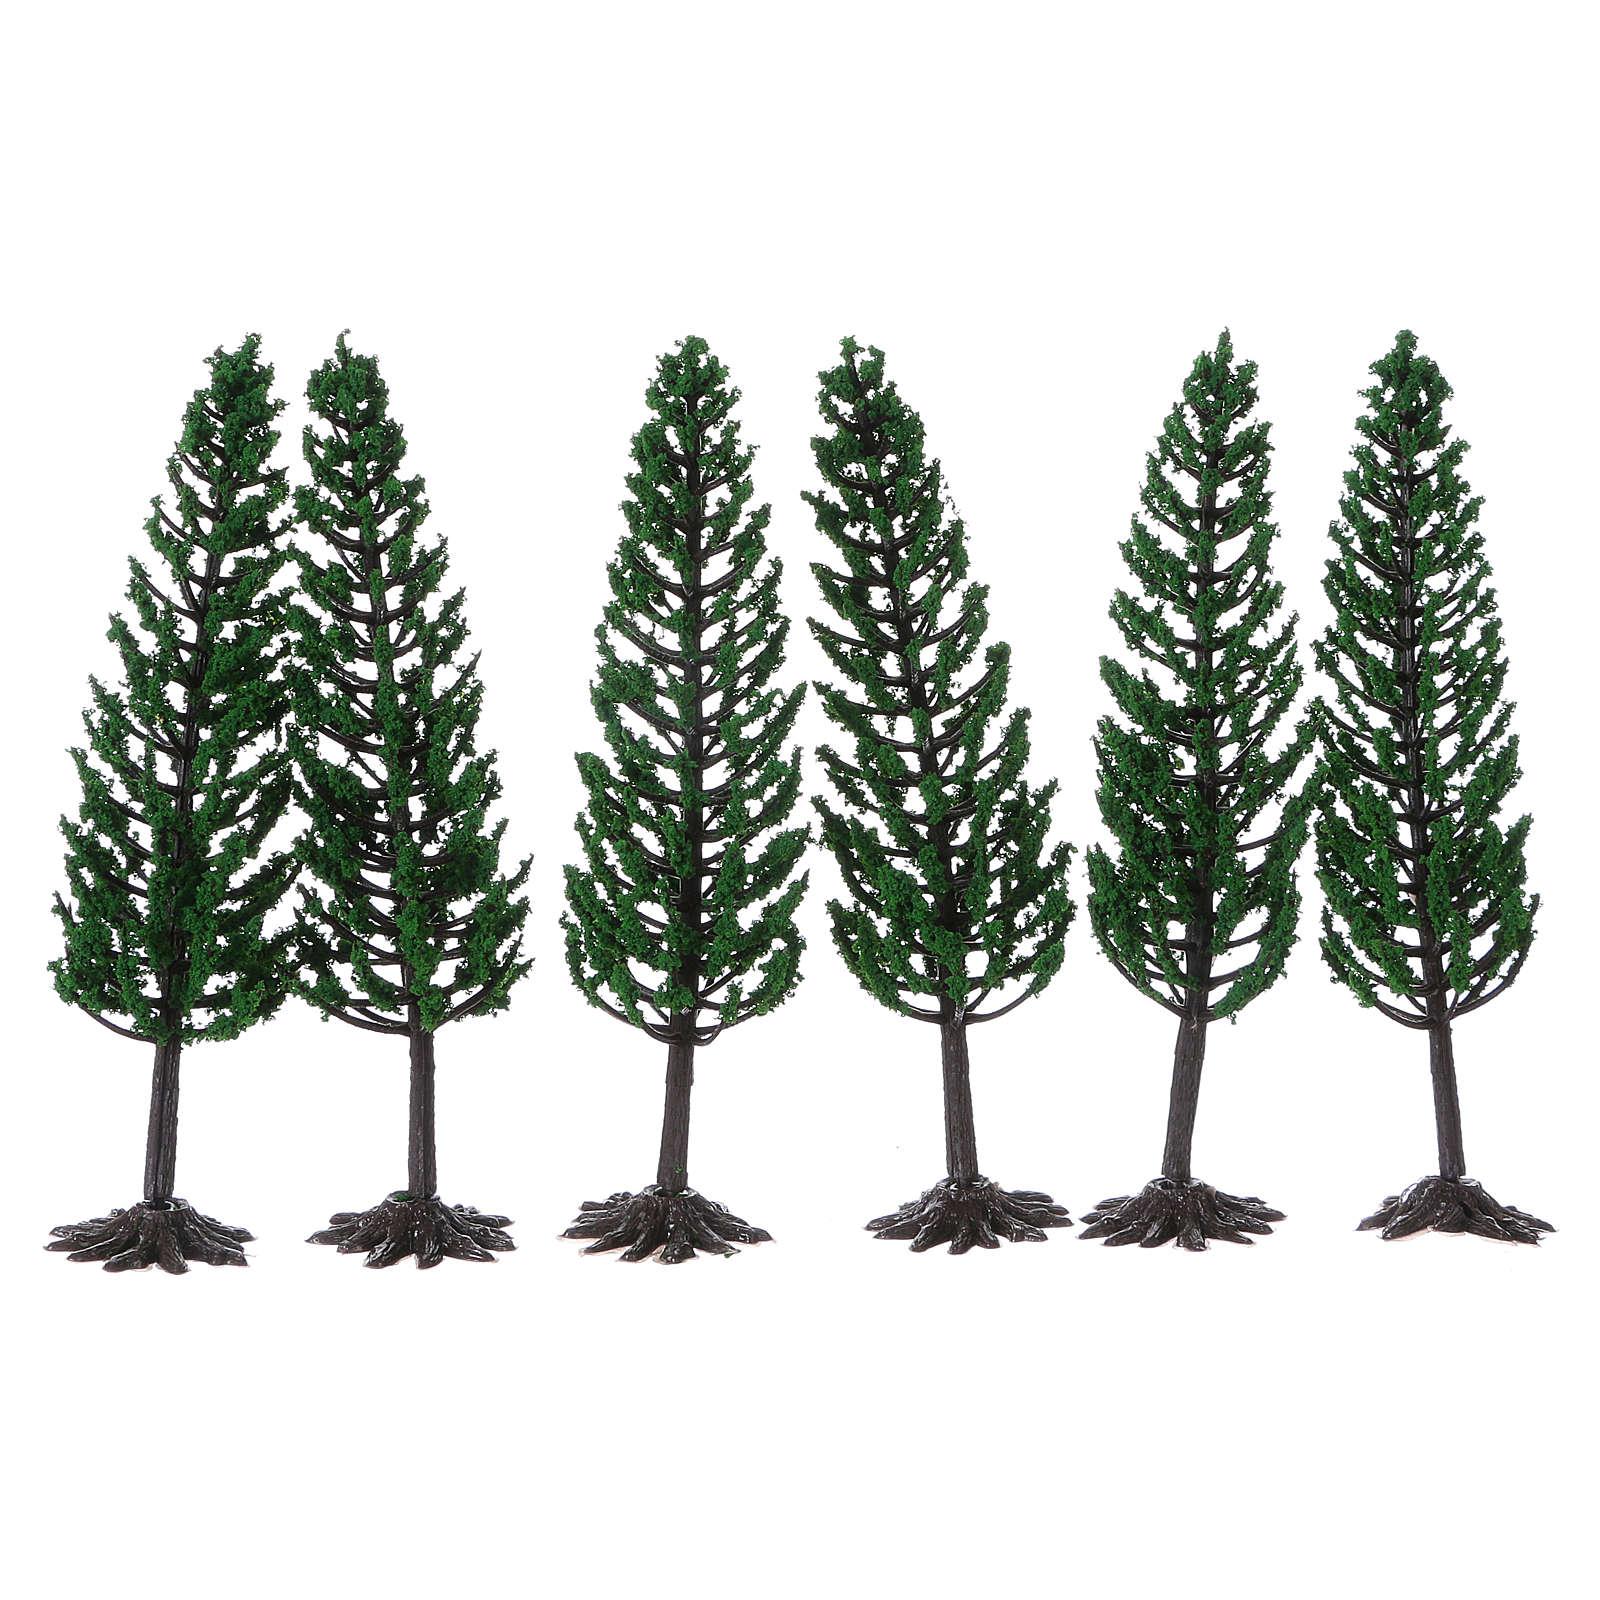 Albero verde per presepe h reale 16 cm 4